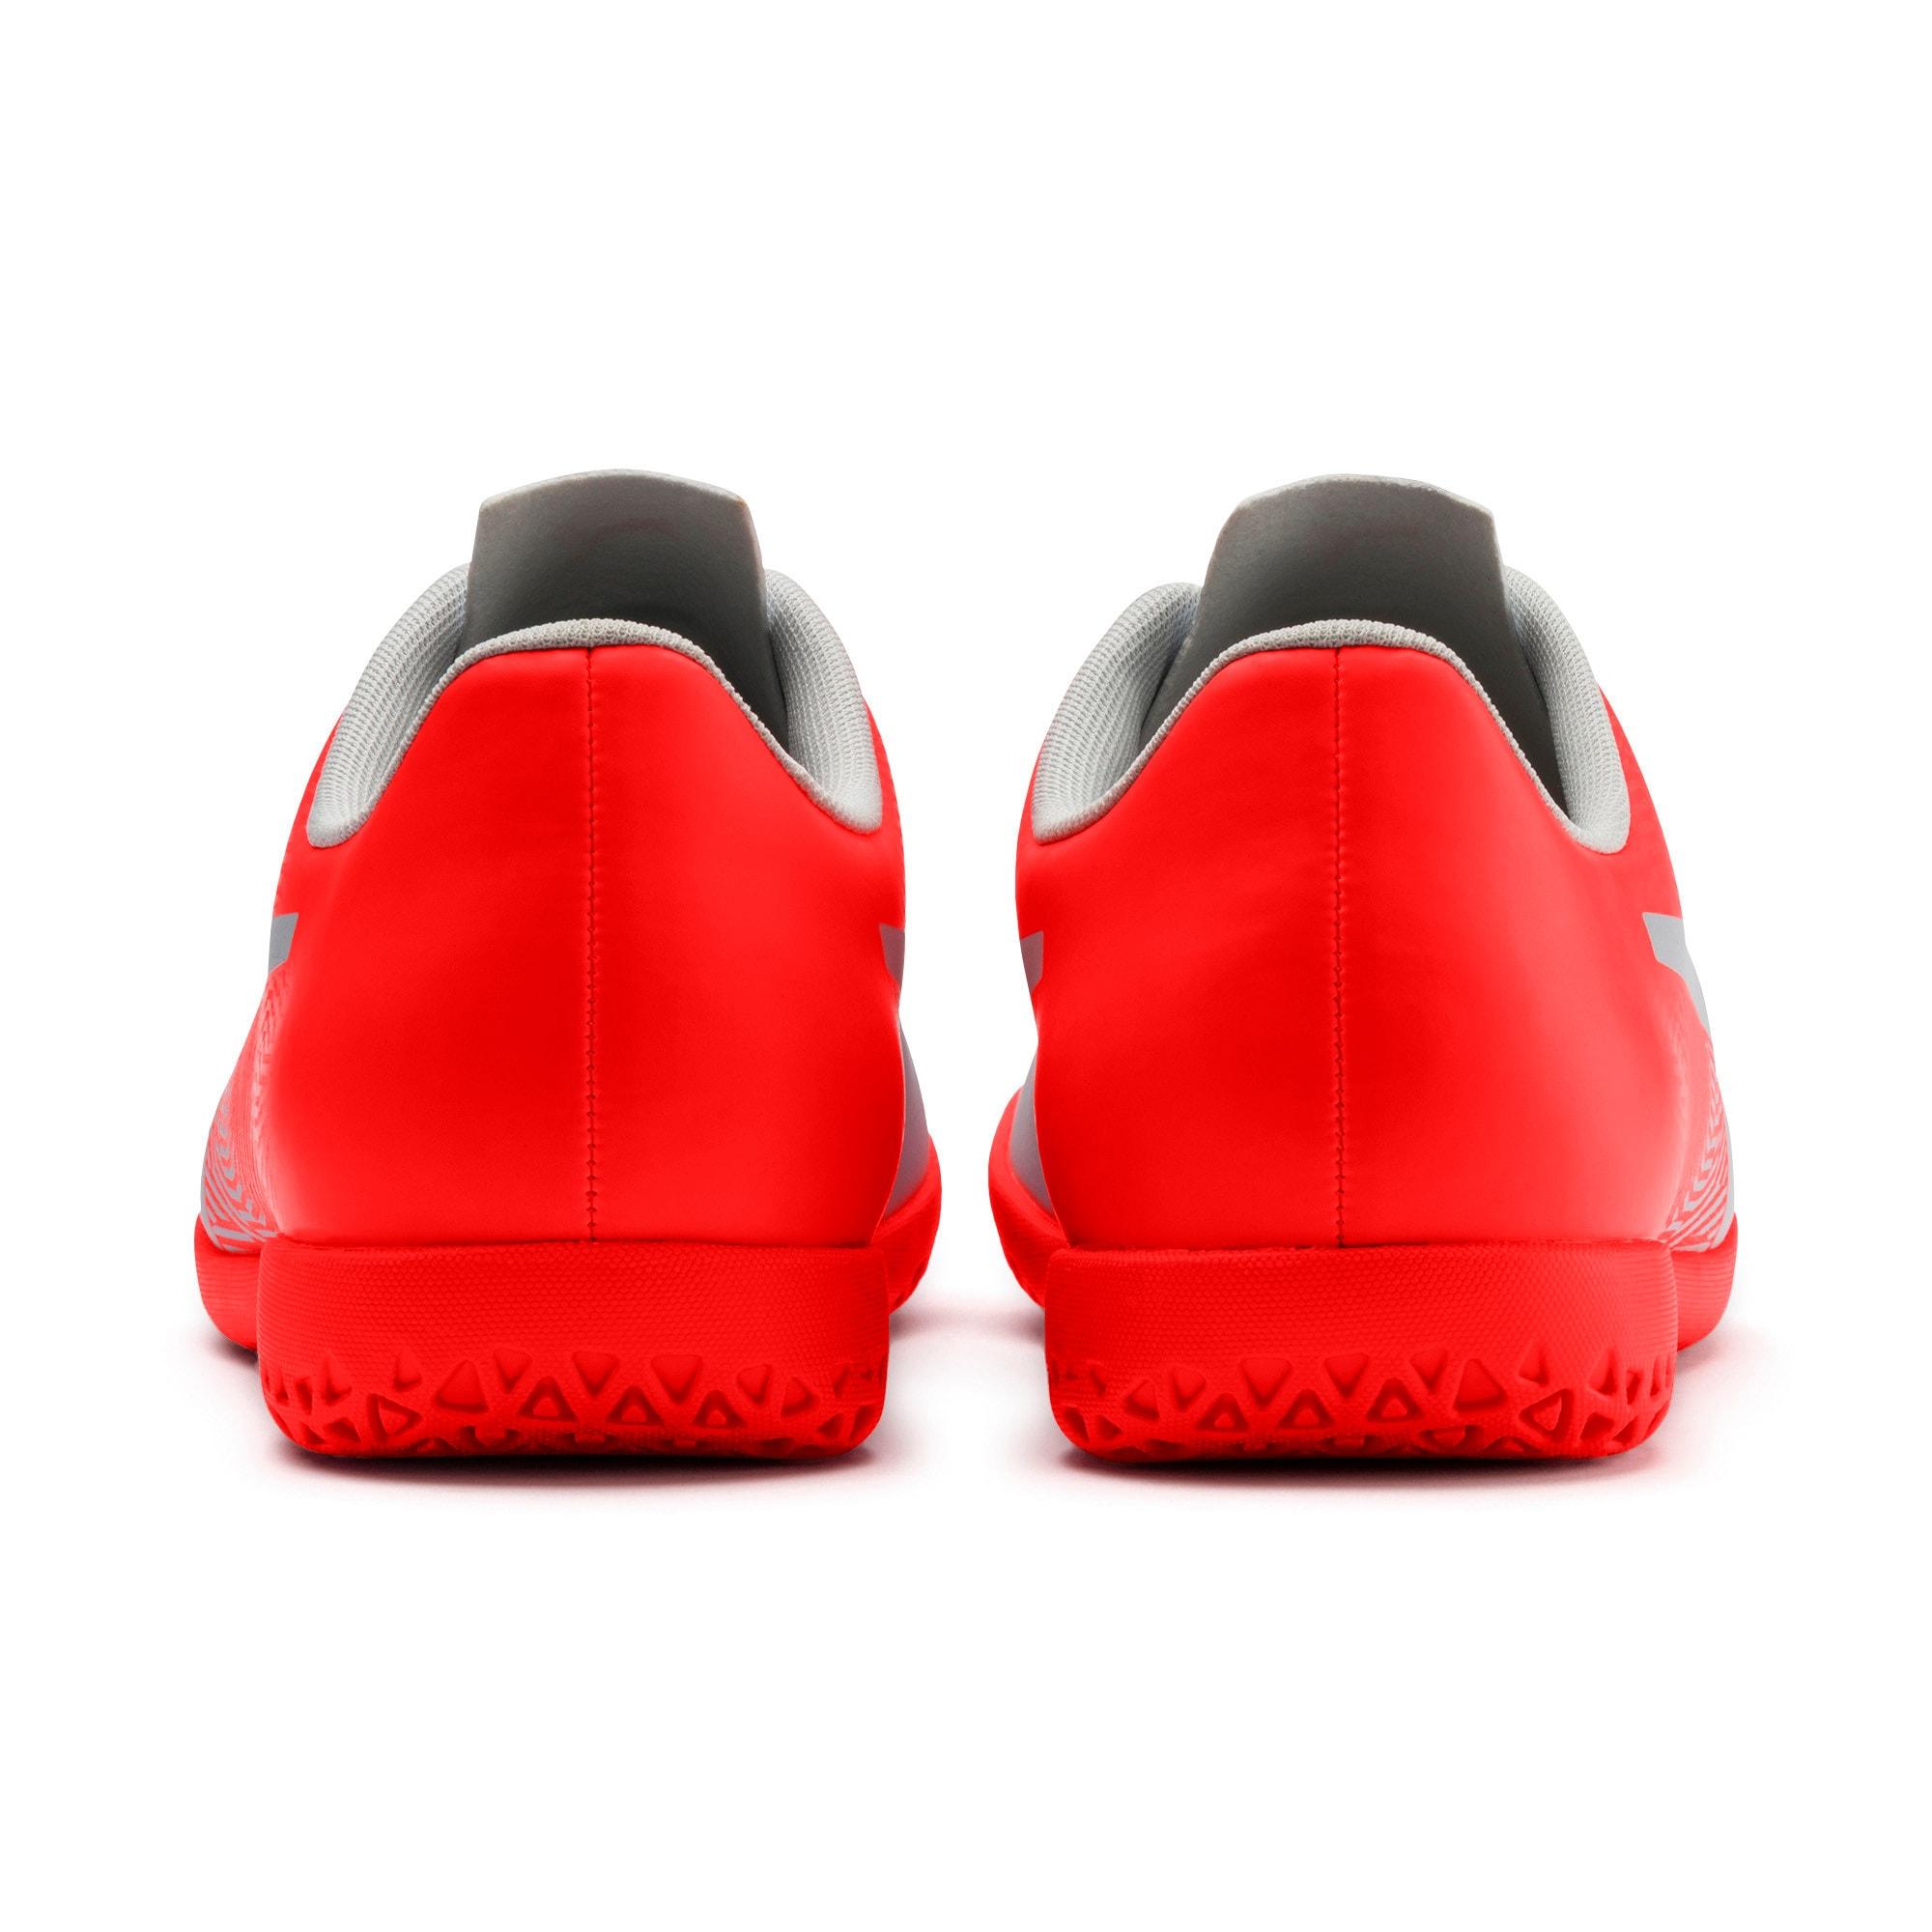 Thumbnail 4 of PUMA Spirit II IT Men's Soccer Shoes, Glacial Blue-Nrgy Red, medium